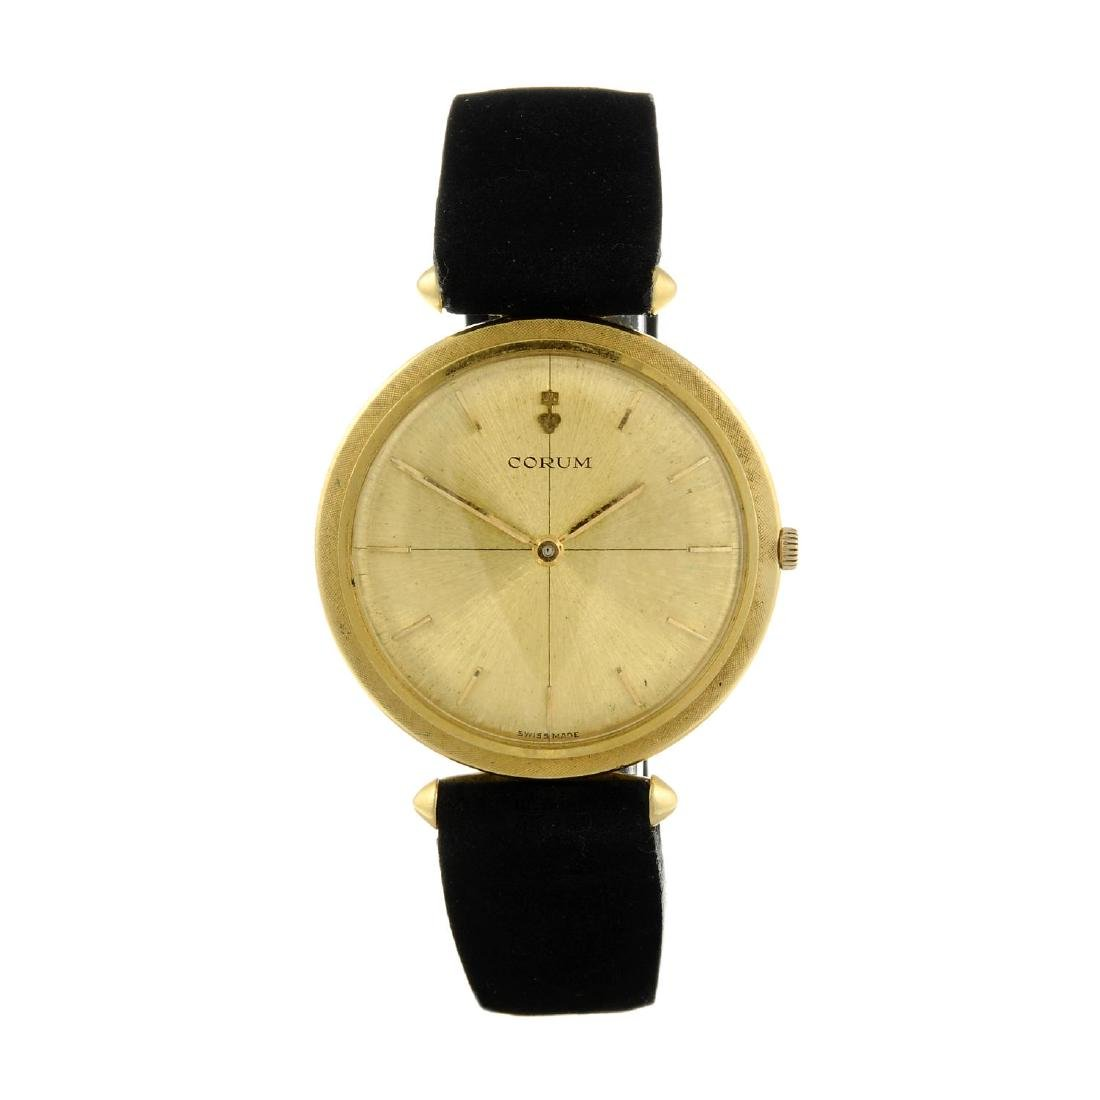 CORUM - a gentleman's wrist watch. Yellow metal case,